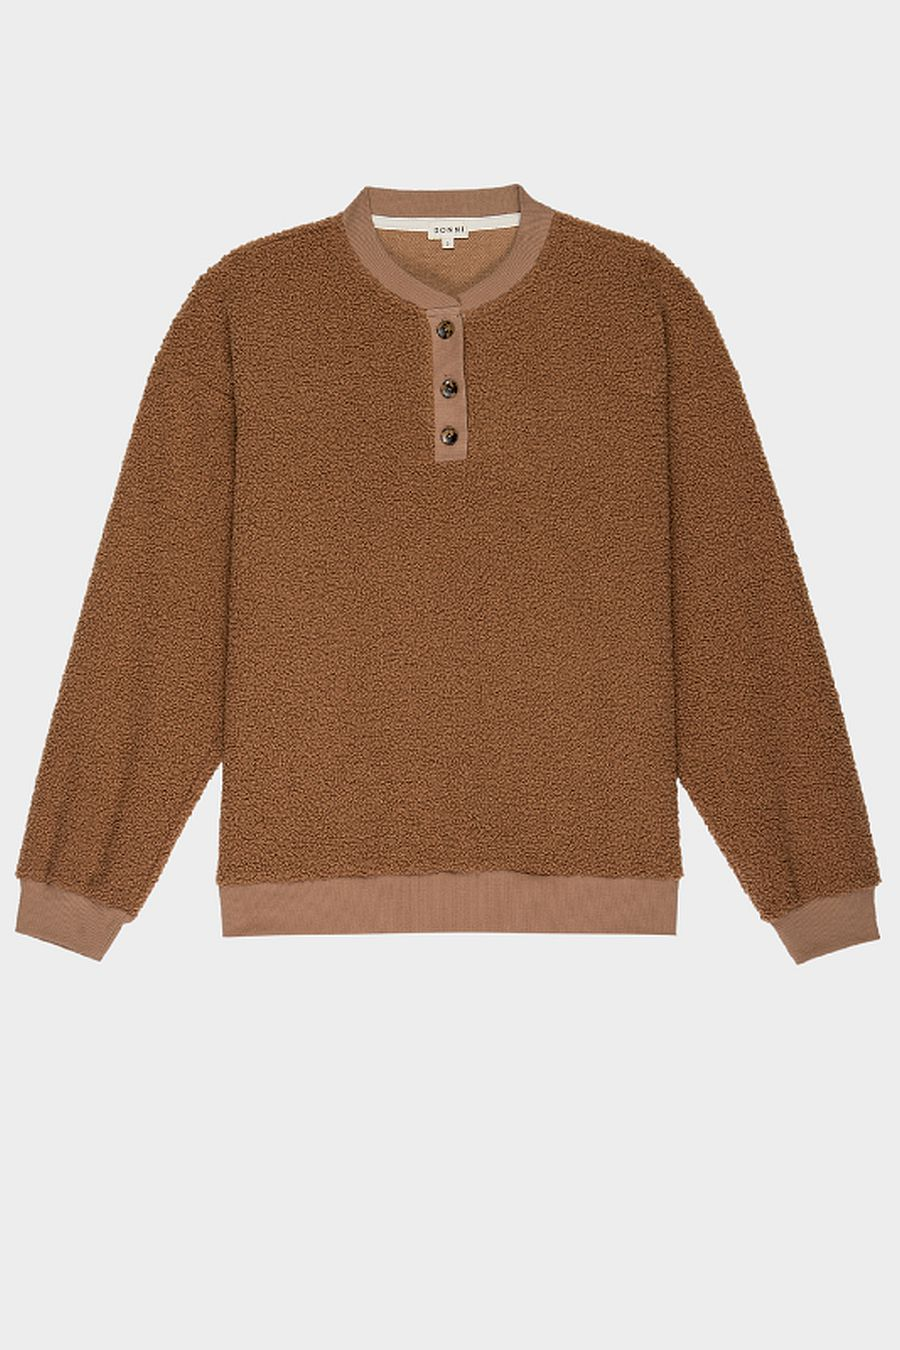 DONNI. Mini Sherpa Henley Sweatshirt - Camel